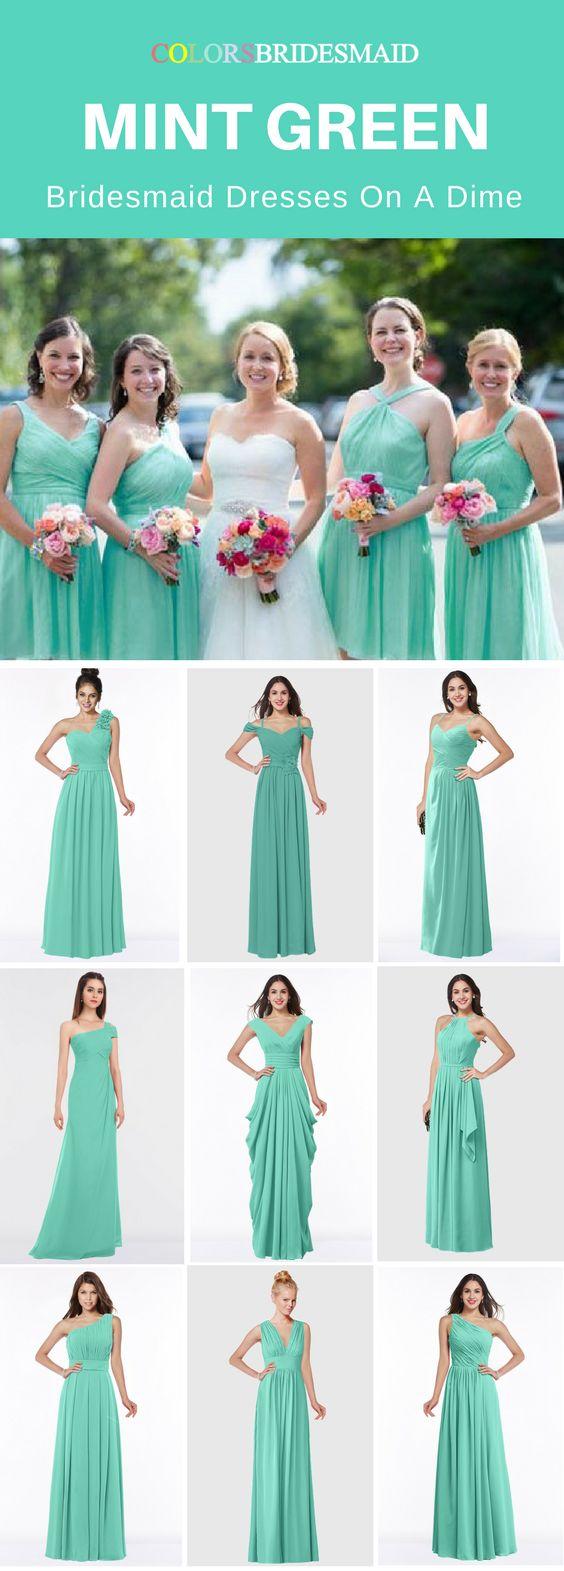 The 77 best Bridesmaids dresses images on Pinterest | Bridesmaids ...